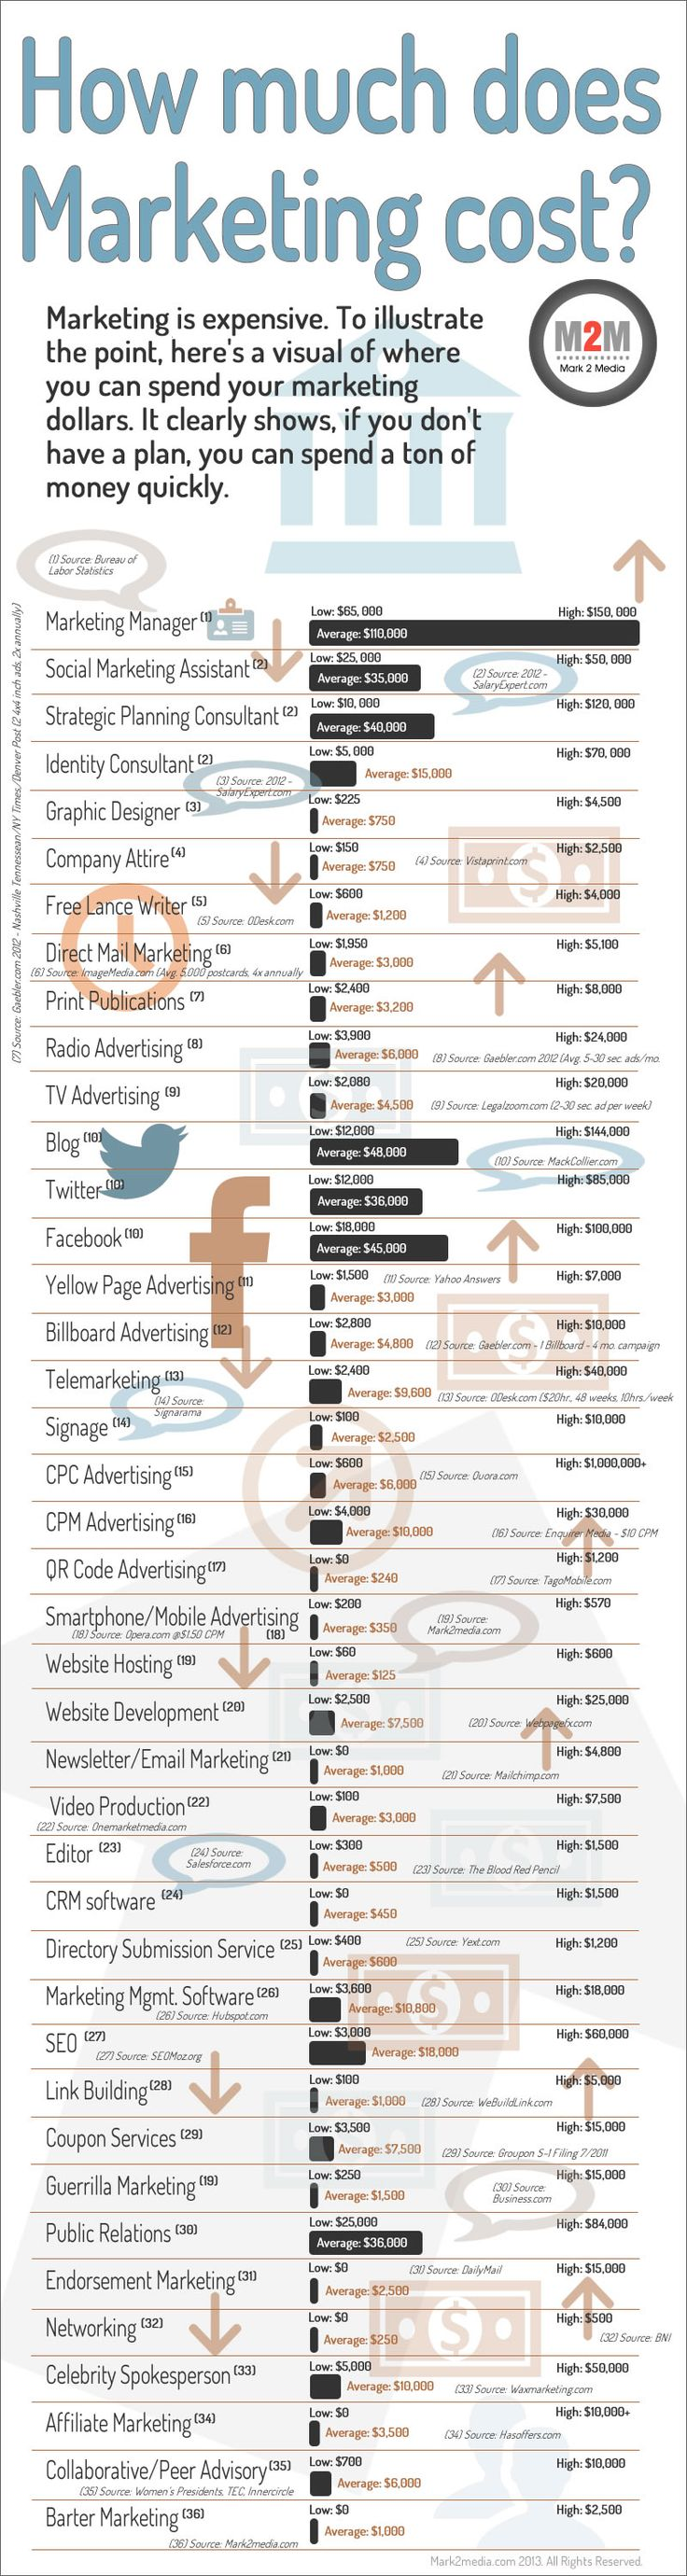 www.makesellgrow.com#socialmedia#tips#idea#viral